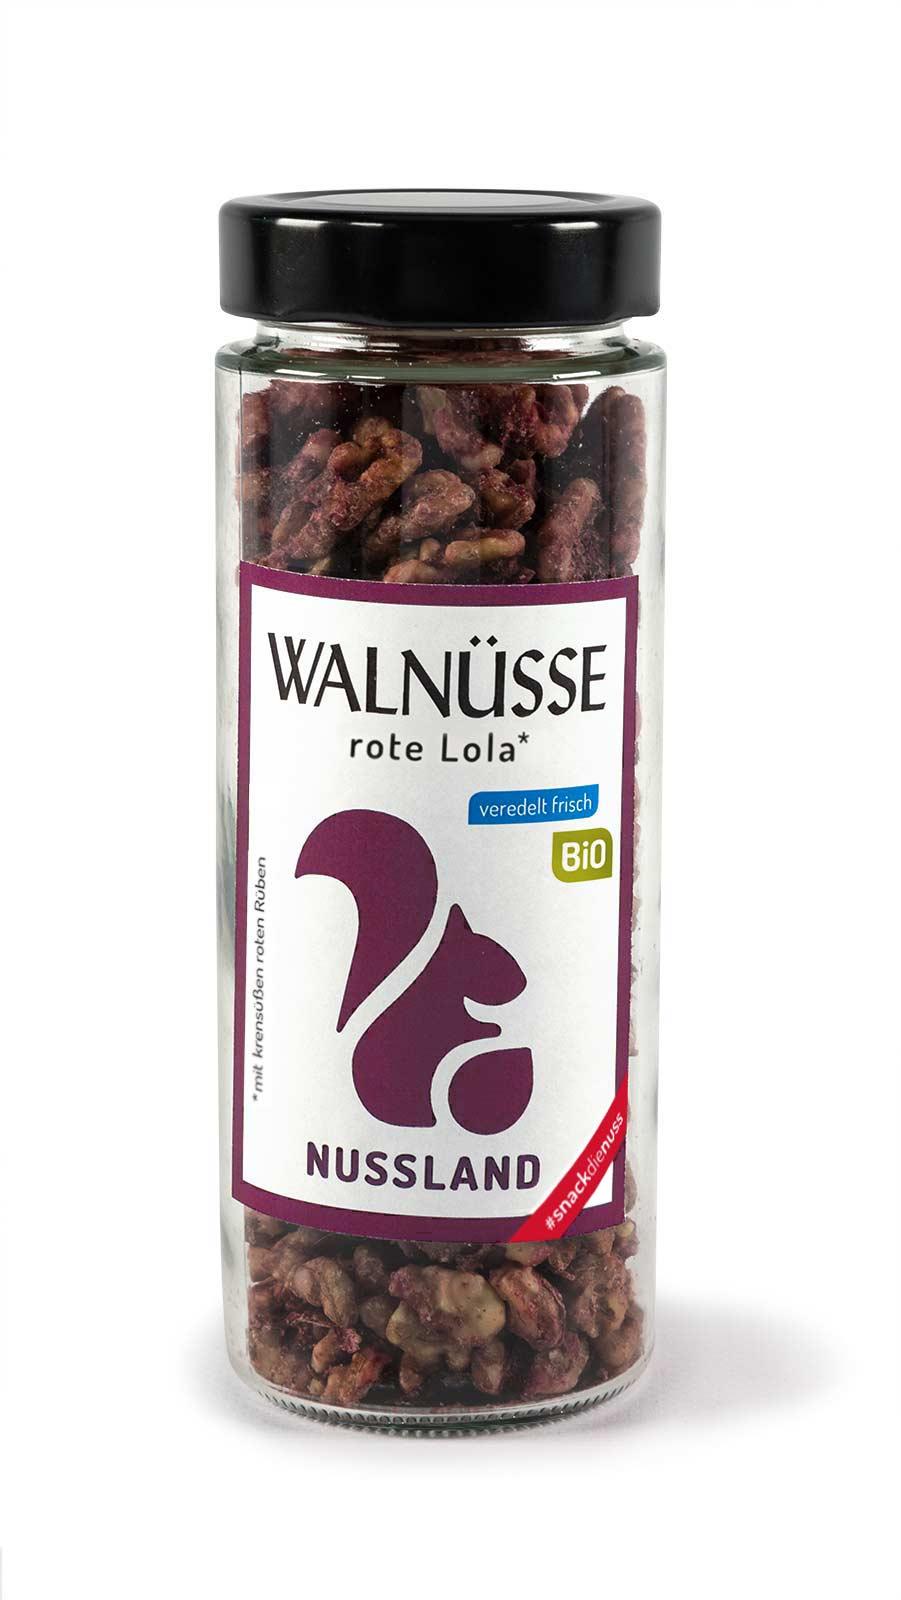 BIO Walnuss-Snack 'rote Lola'